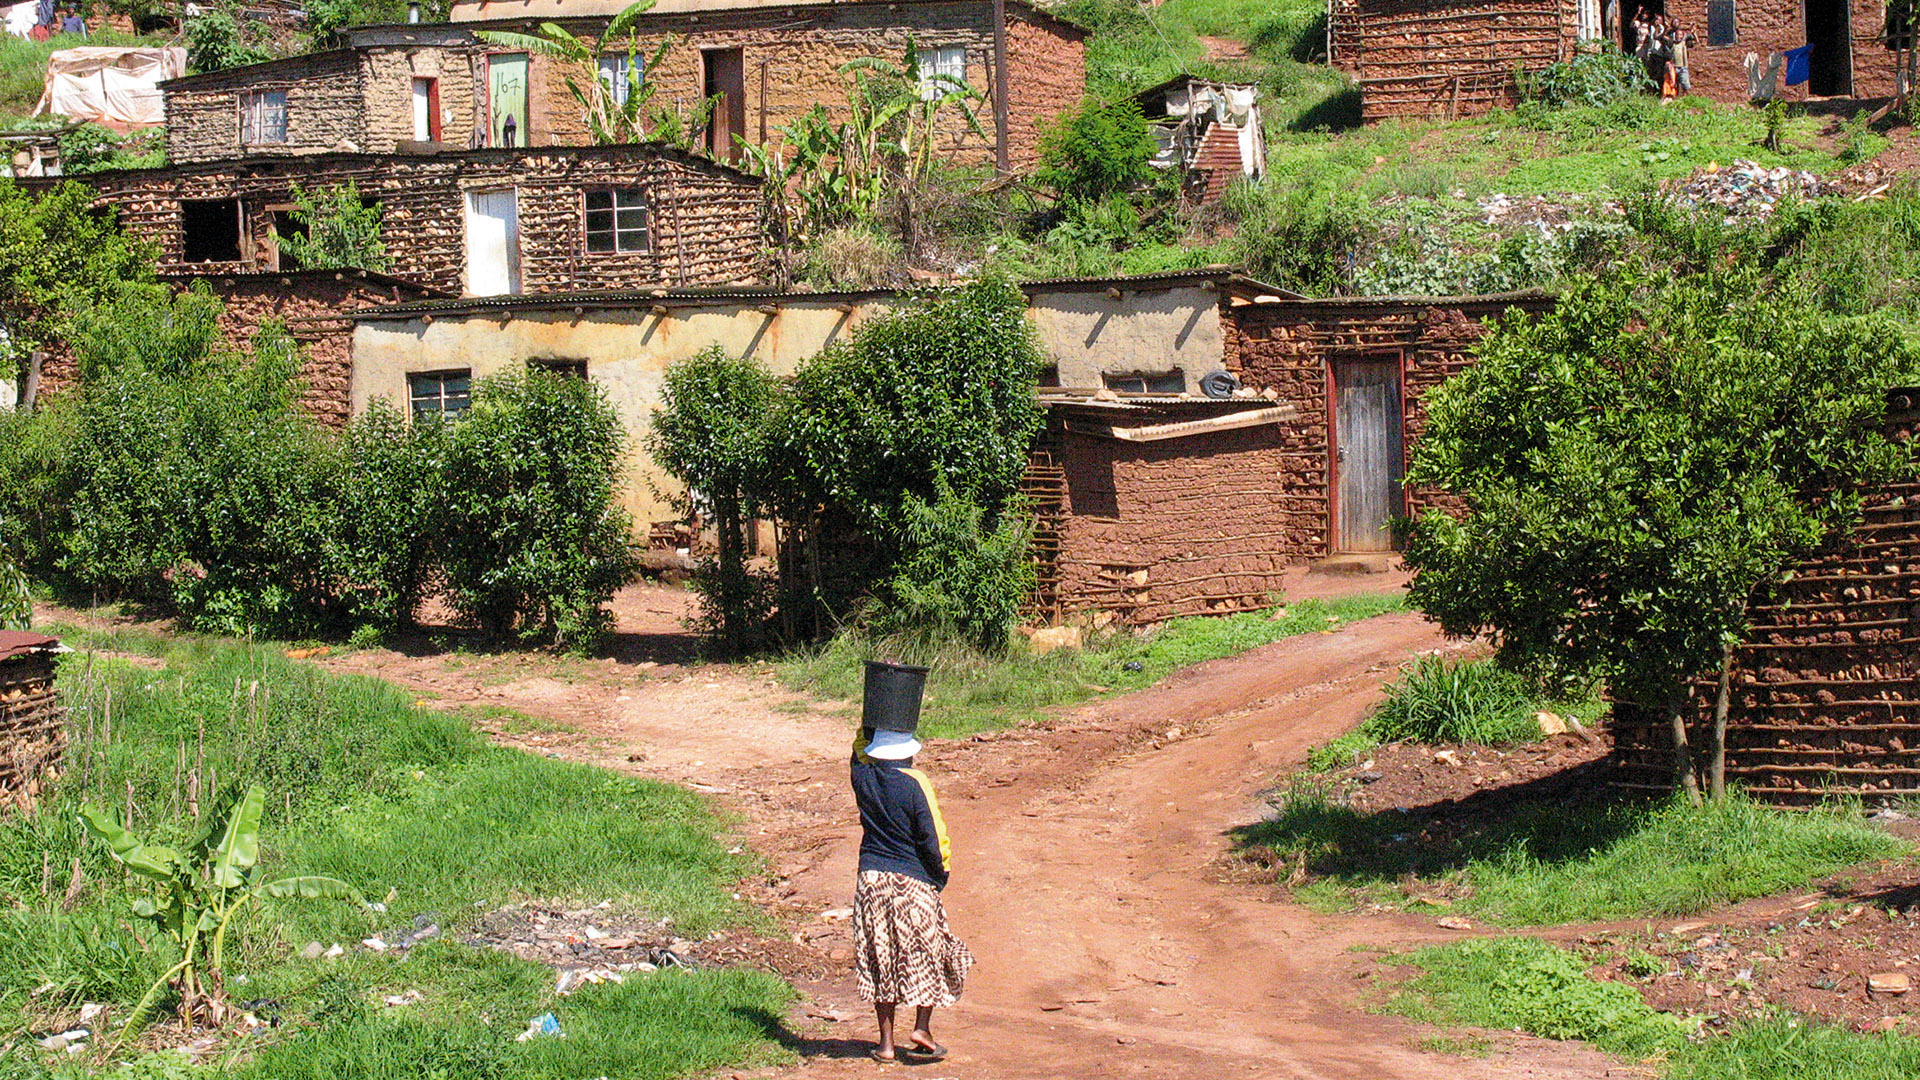 Willkommen in Shakas Land